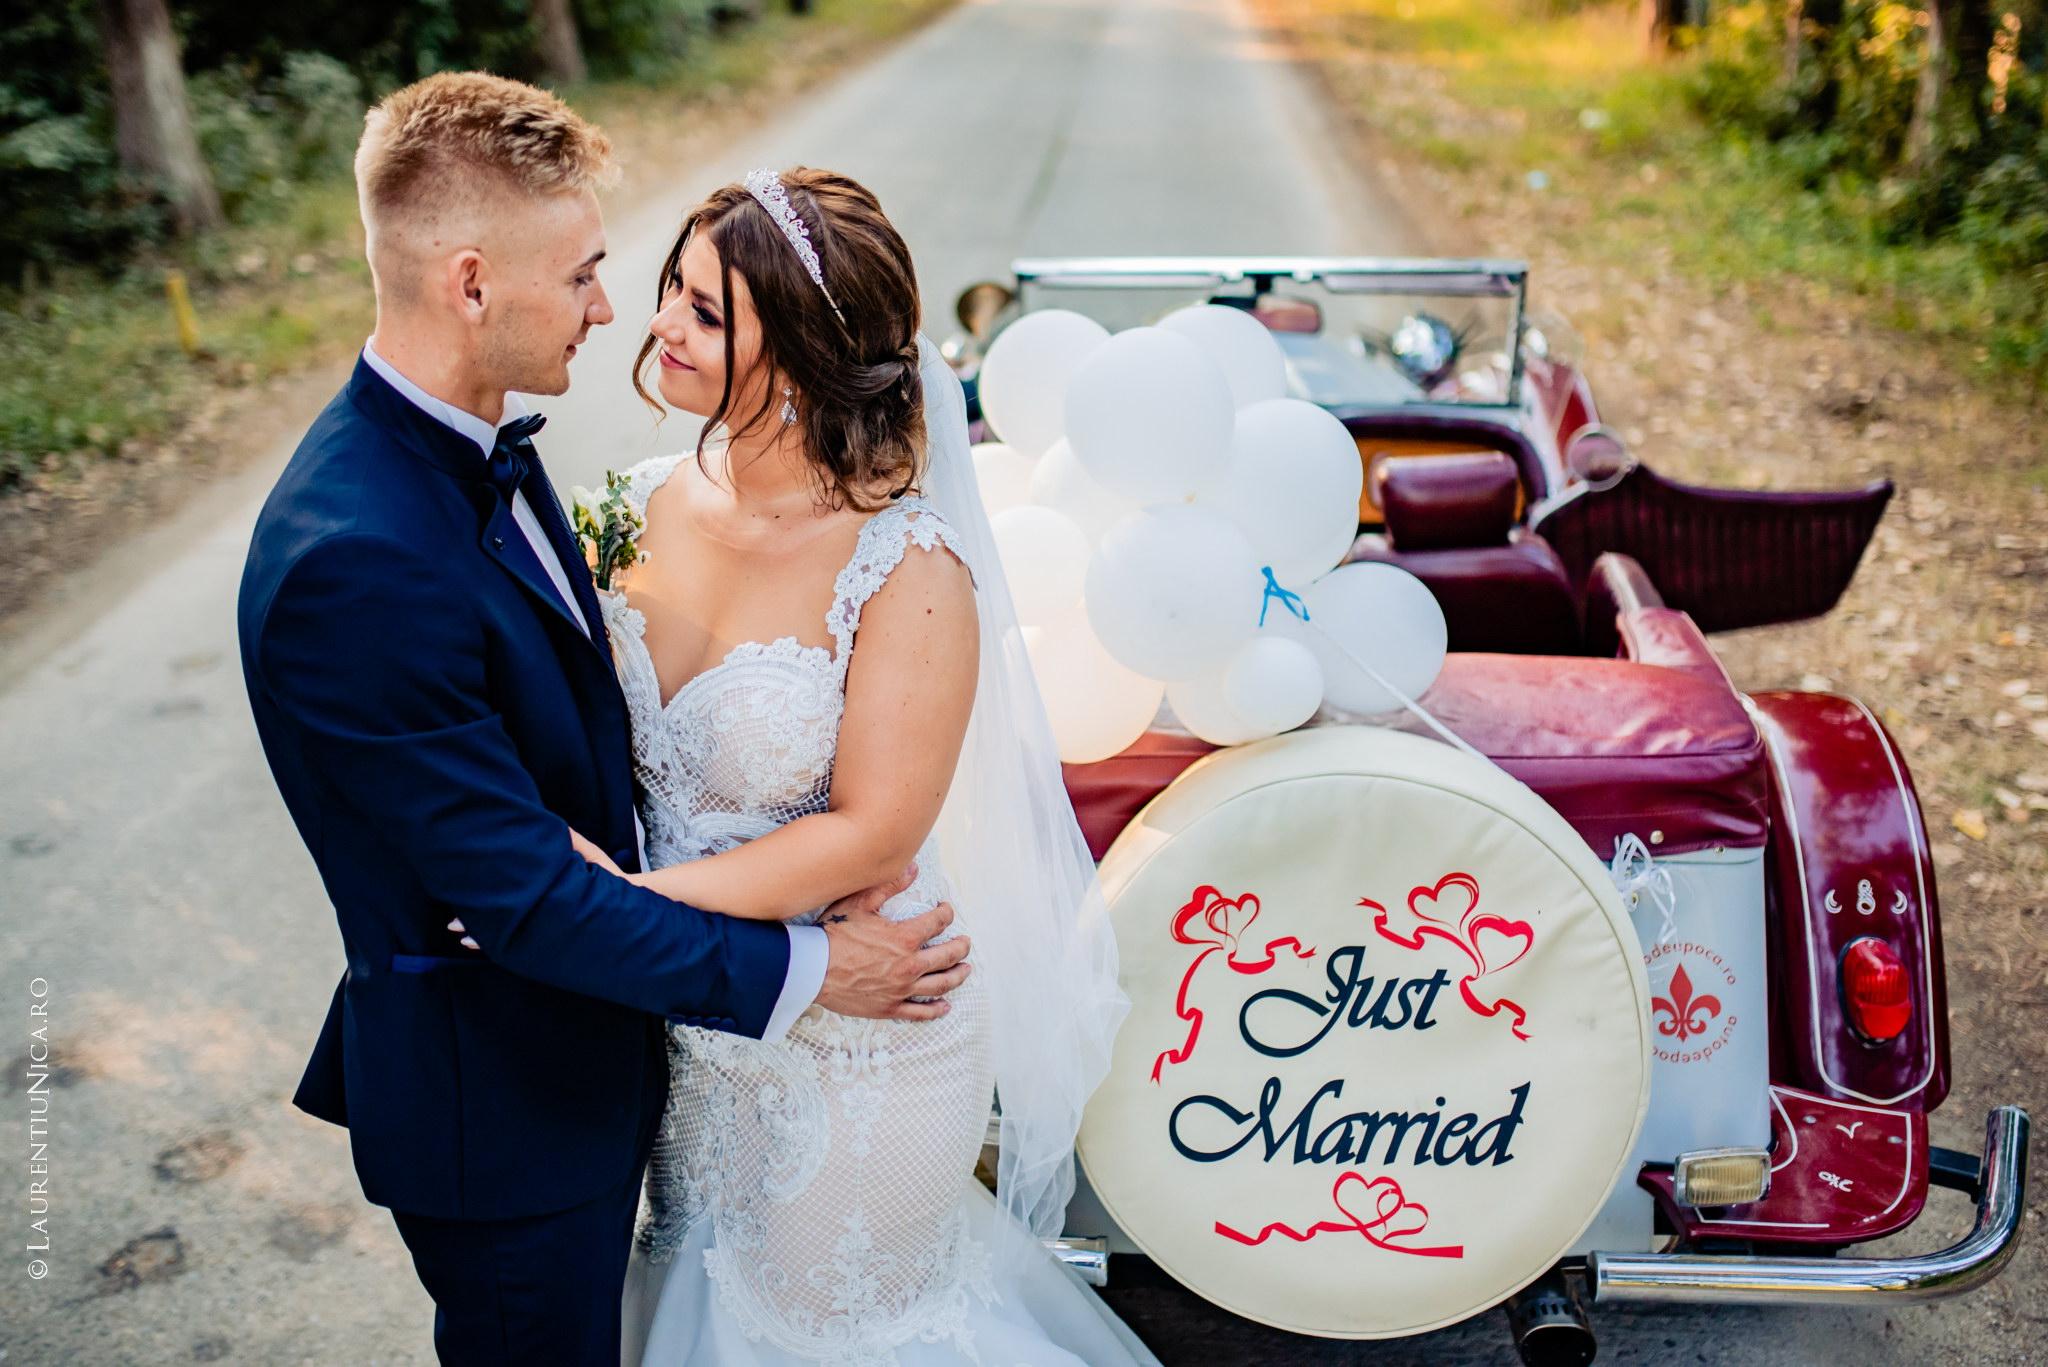 fotografii nunta Roxana si Cosmin fotograf nunta laurentiu nica 27 - Roxana & Cosmin | Fotografii nunta | Ticleni, judetul Gorj